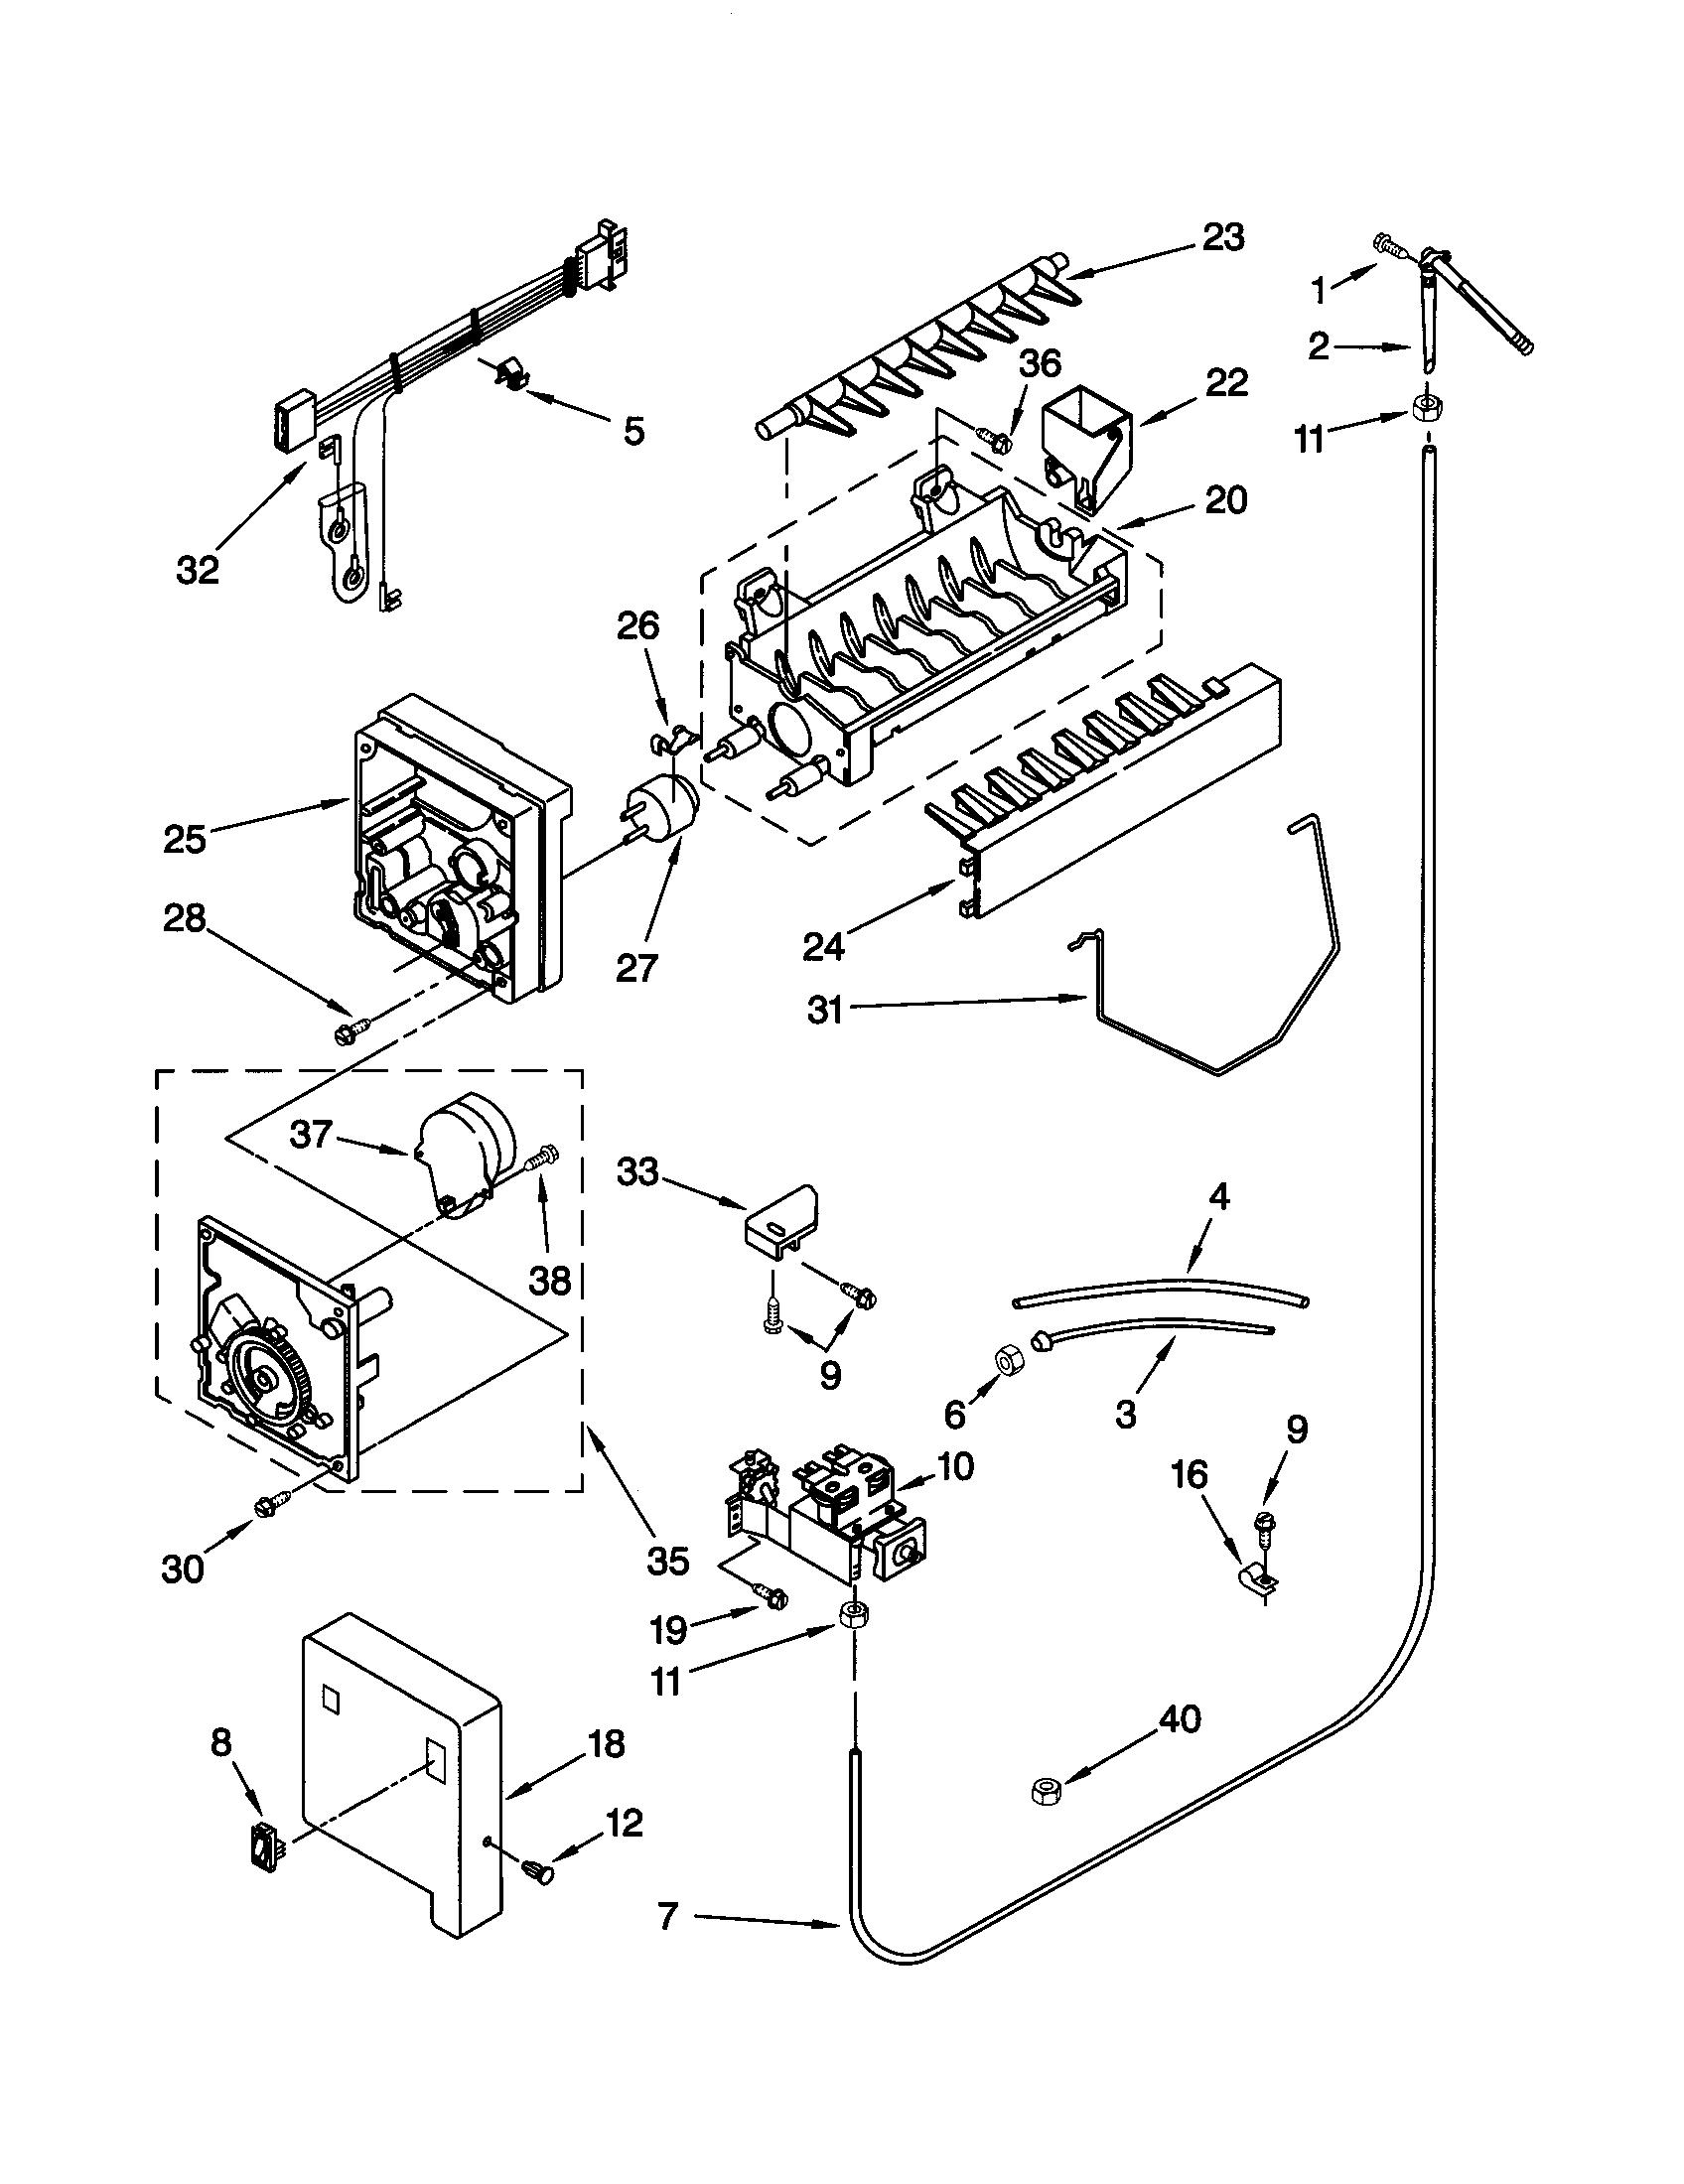 ZT_4706] Ice Maker Wiring Diagram Also Kenmore Refrigerator Ice Maker  Diagram Wiring DiagramOupli Pala Antus Tixat Rosz Trons Mohammedshrine Librar Wiring 101